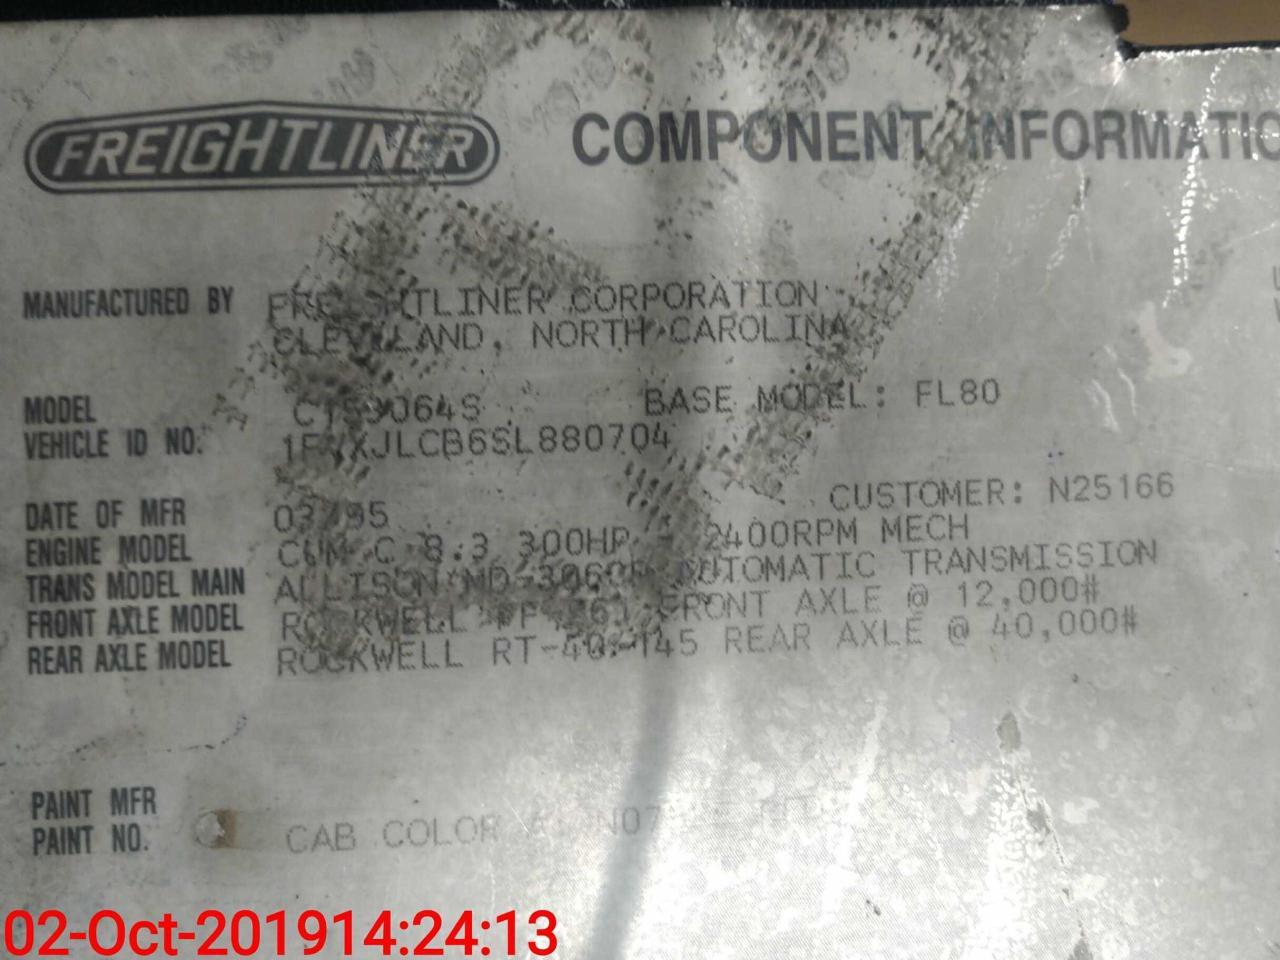 1995 Freightliner FL80